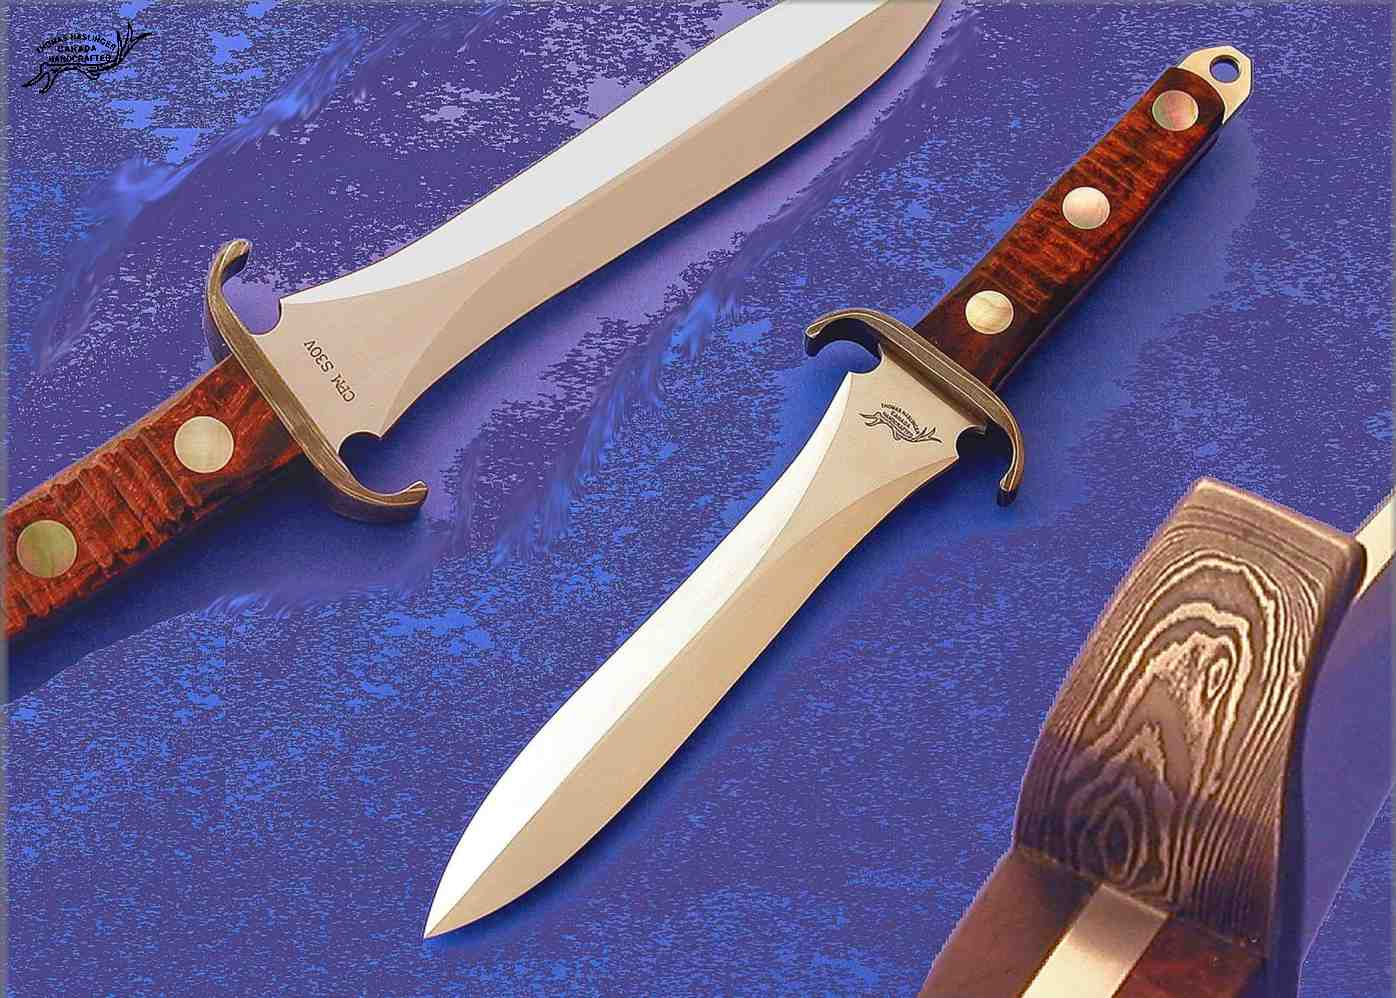 EK Dagger with black lip pearl inlays